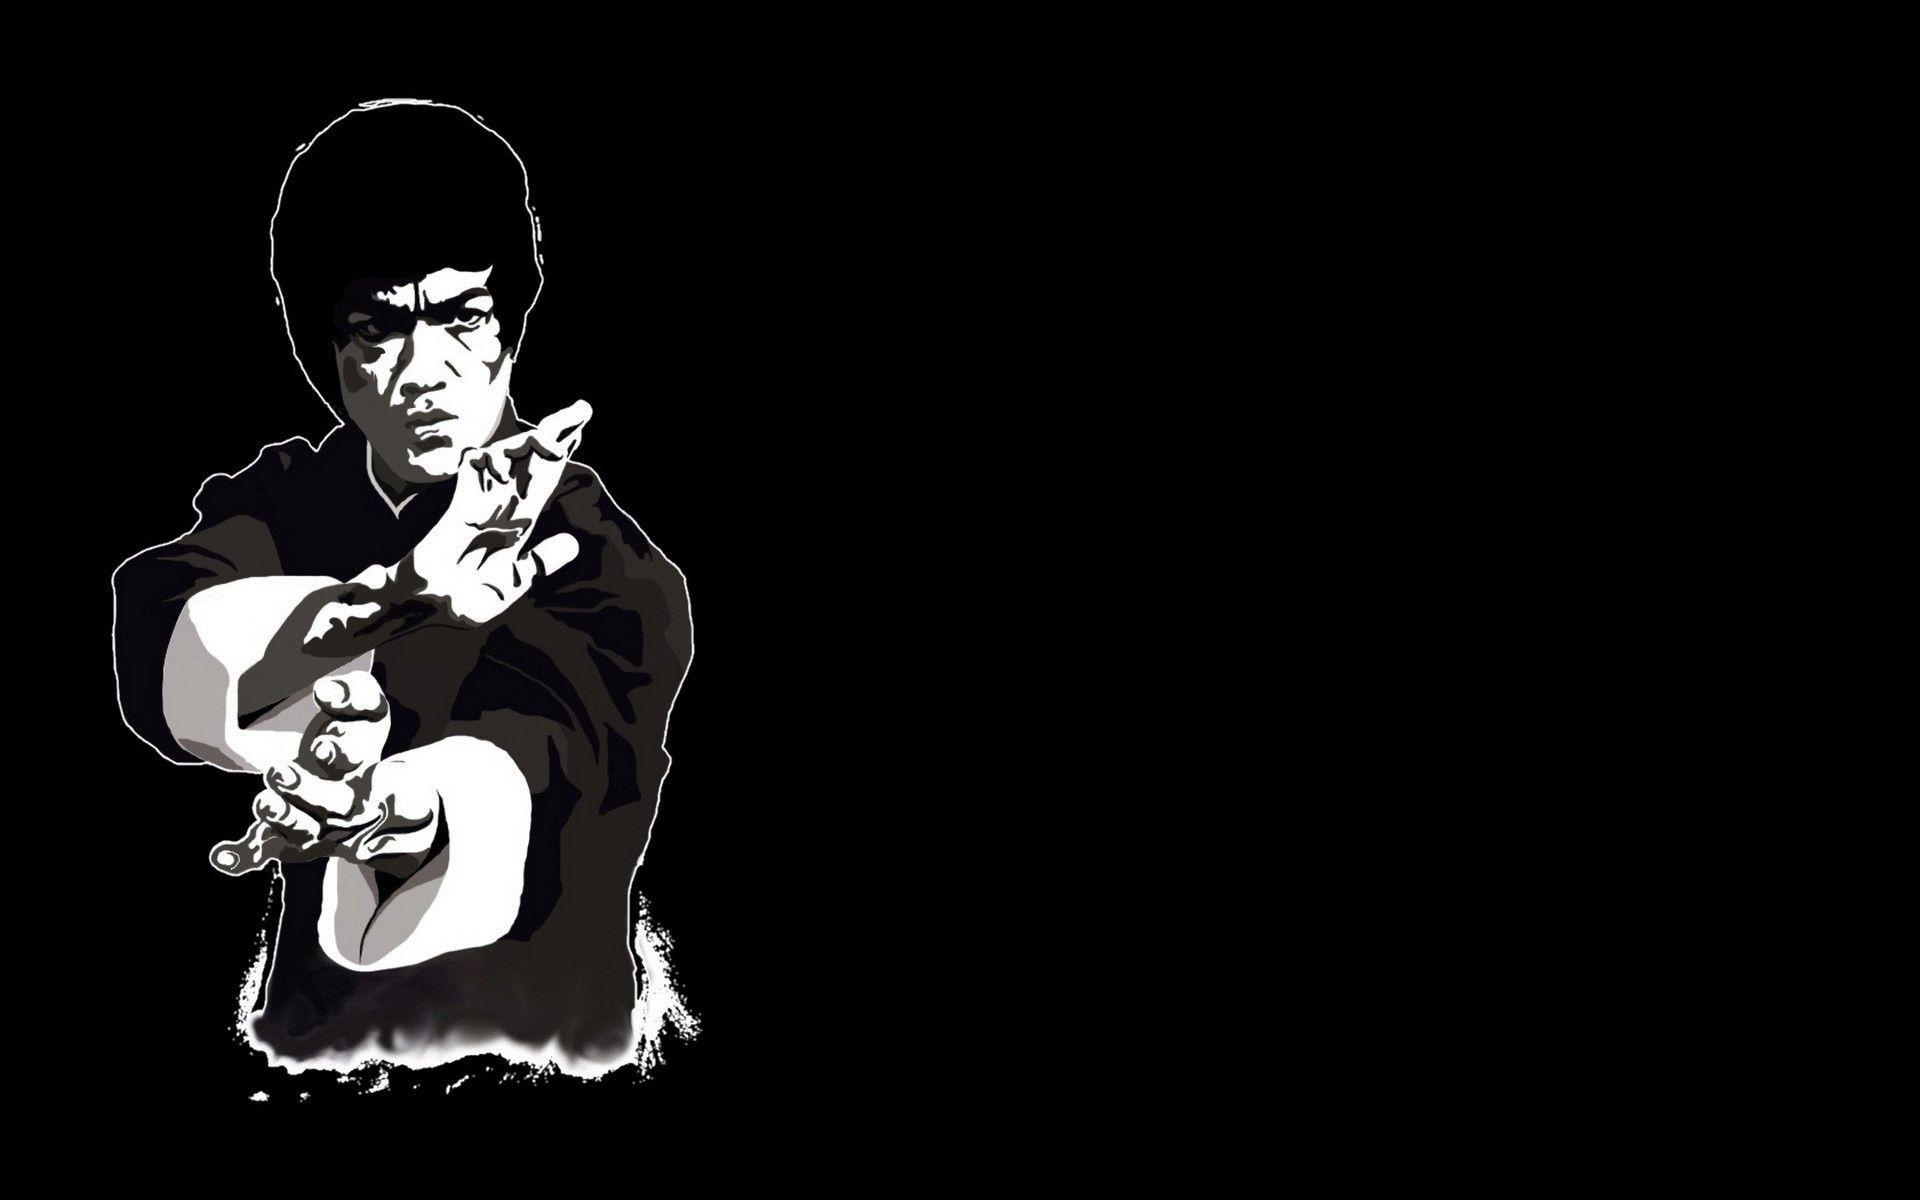 Elegant Bruce Lee Hd Wallpaper Iphone